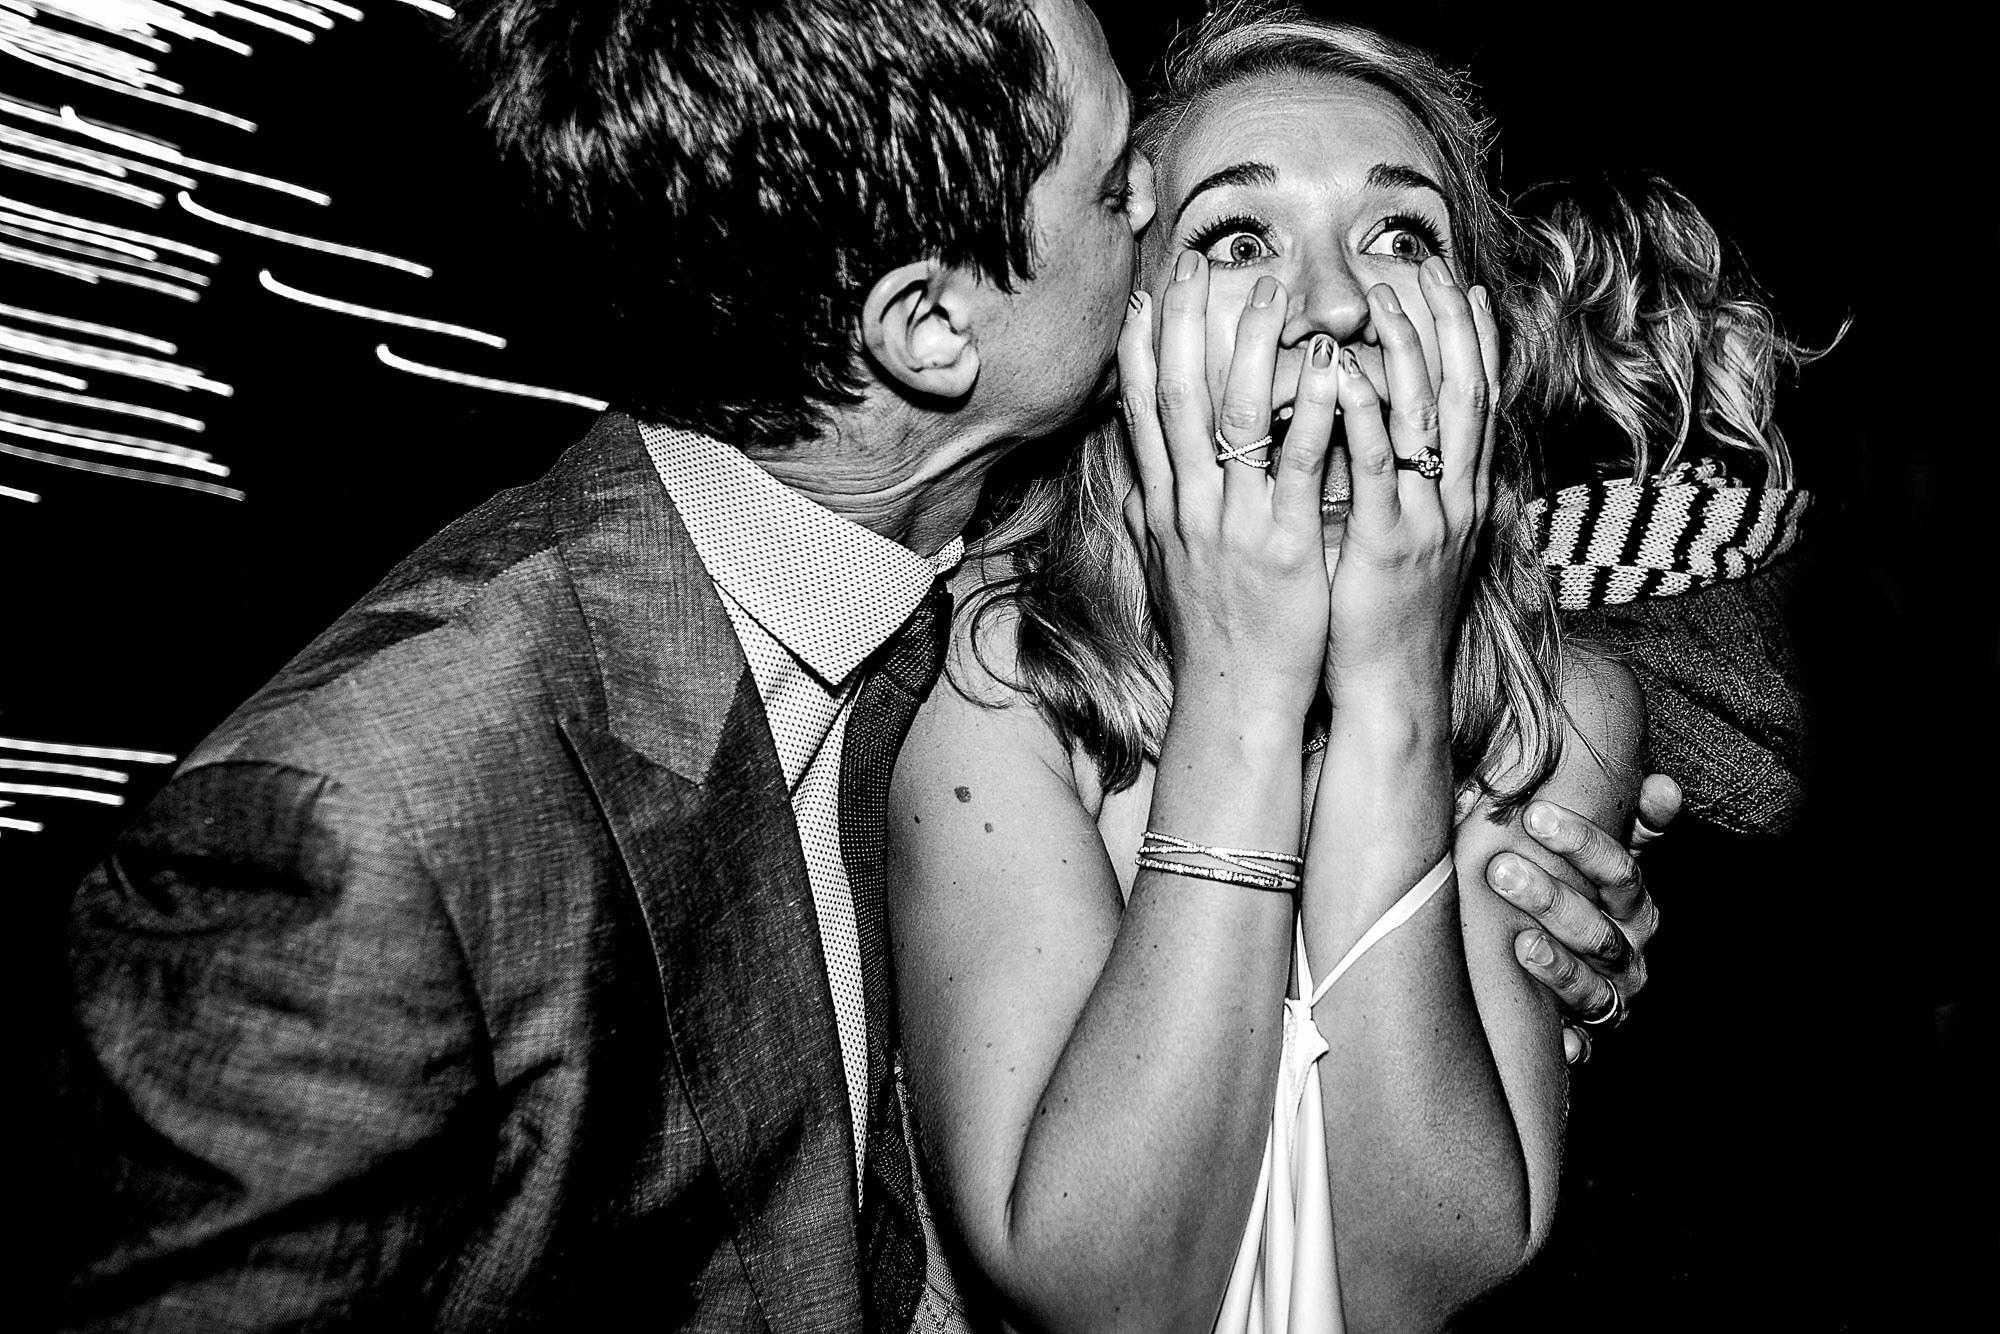 Bride totally suprised - photo by Jos Studios